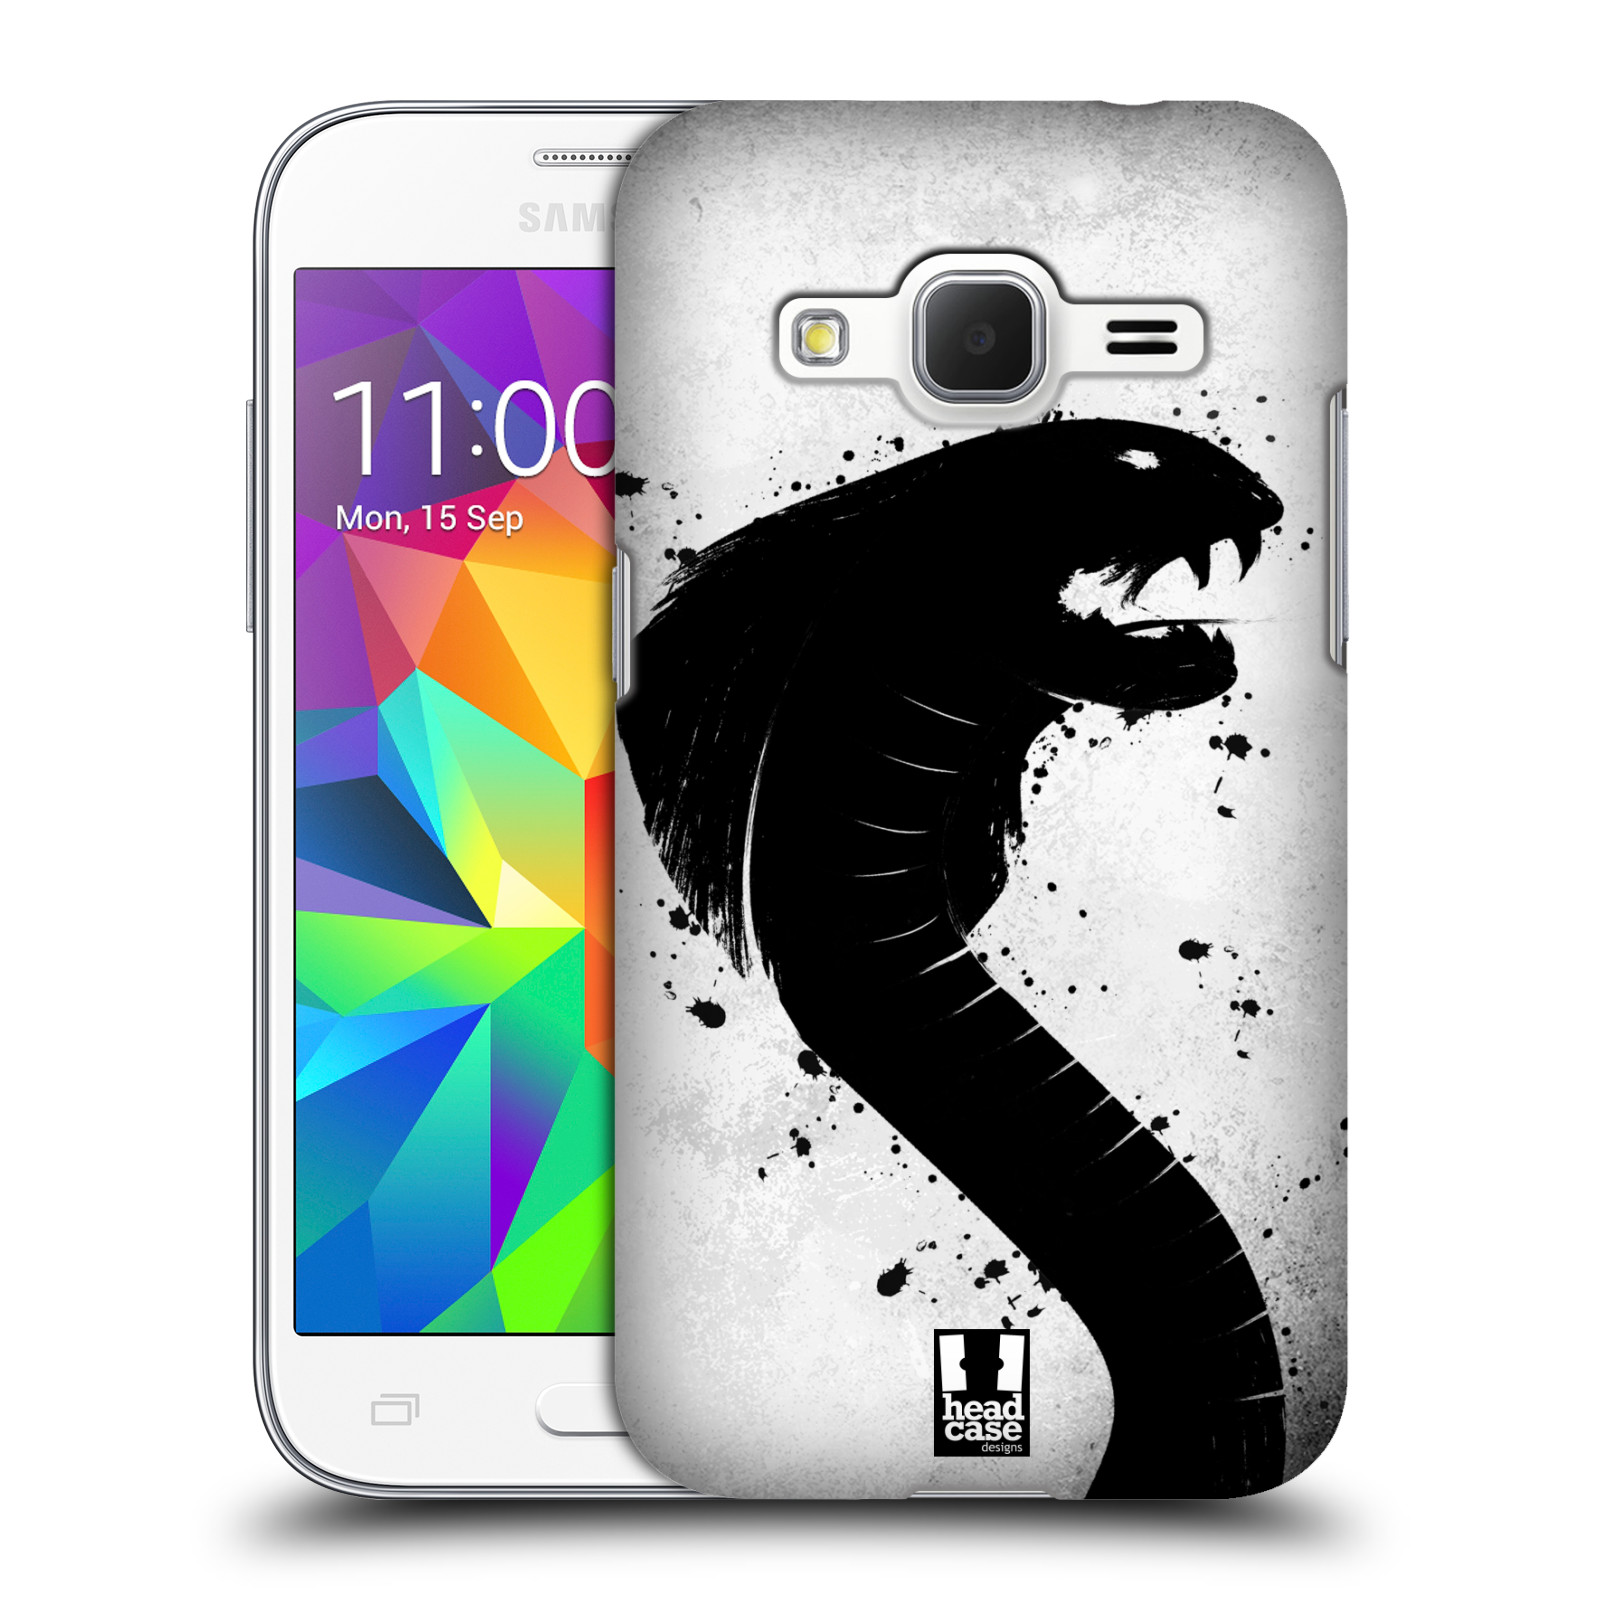 HEAD CASE plastový obal na mobil SAMSUNG GALAXY Core Prime (Core Prime VE) vzor Kresba tuš zvíře had kobra